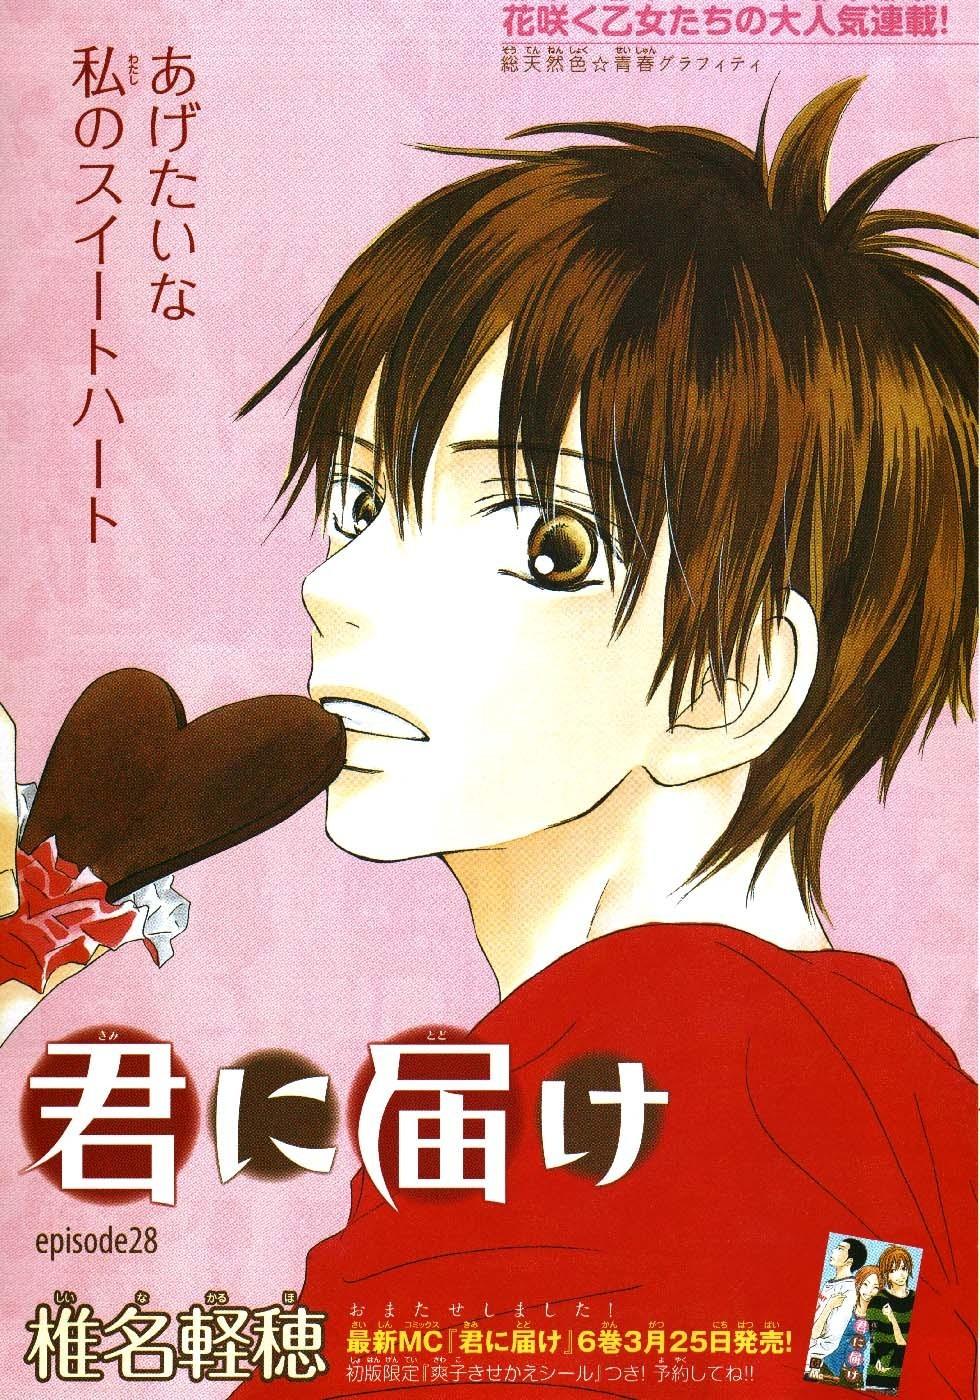 Para los fanaticos del shojo Shouta-Kazehaya-kimi-ni-todoke-9235184-980-1400